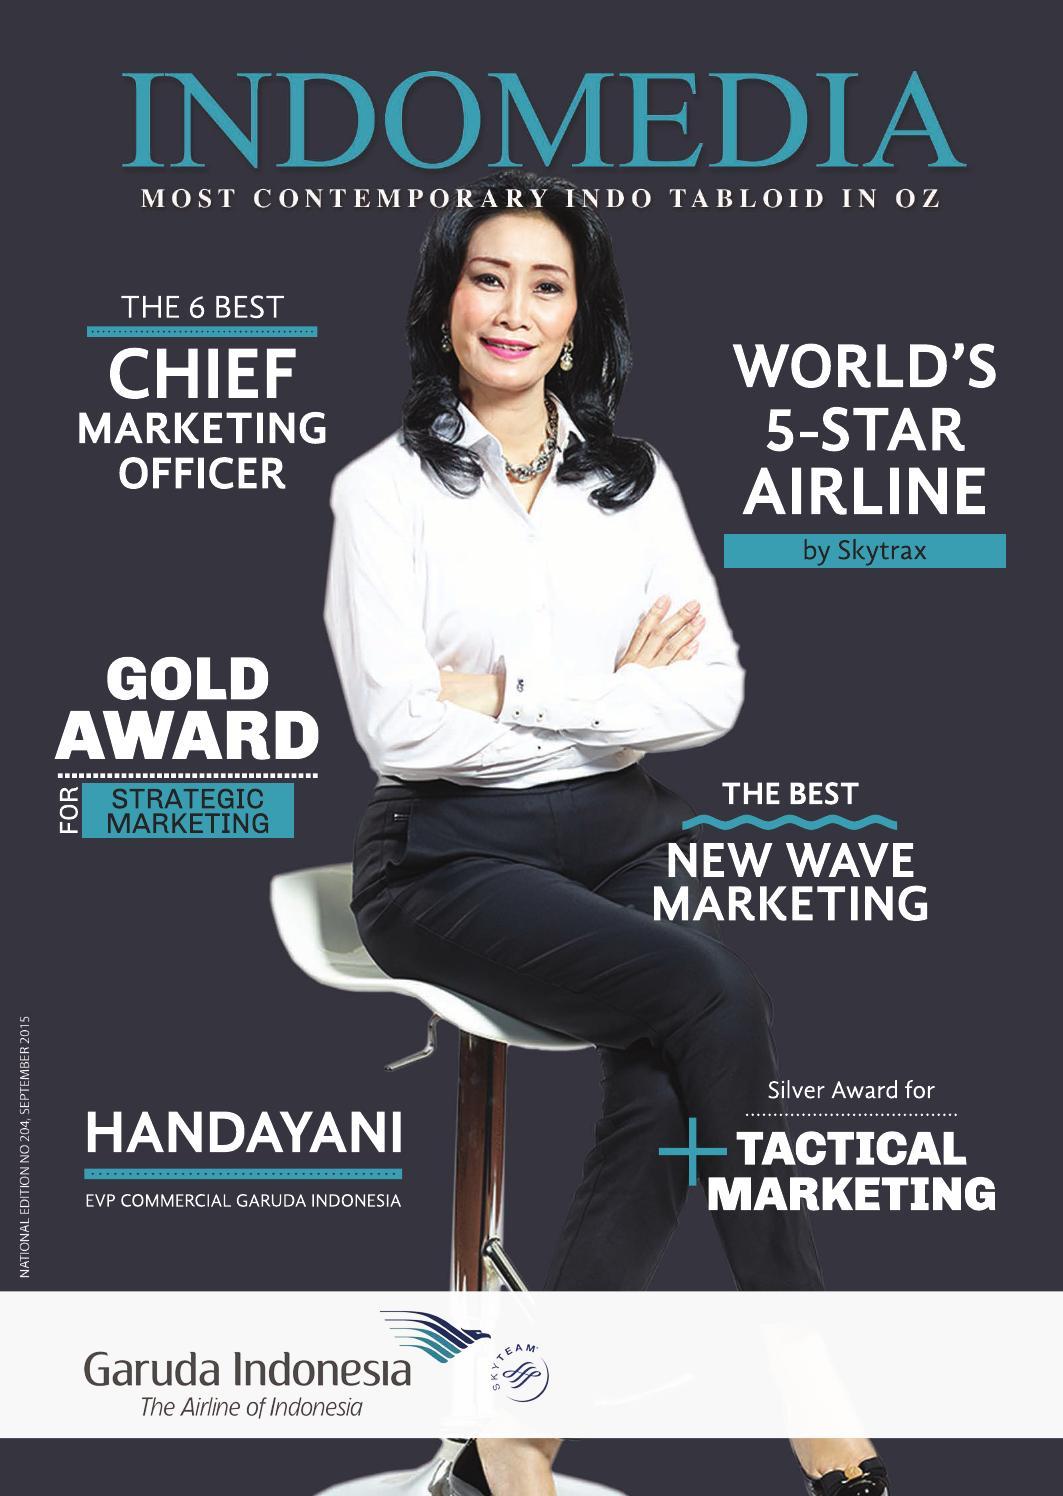 INDOMEDIA SEPTEMBER 2015 by Indo Media - issuu d1ec3f8ca8